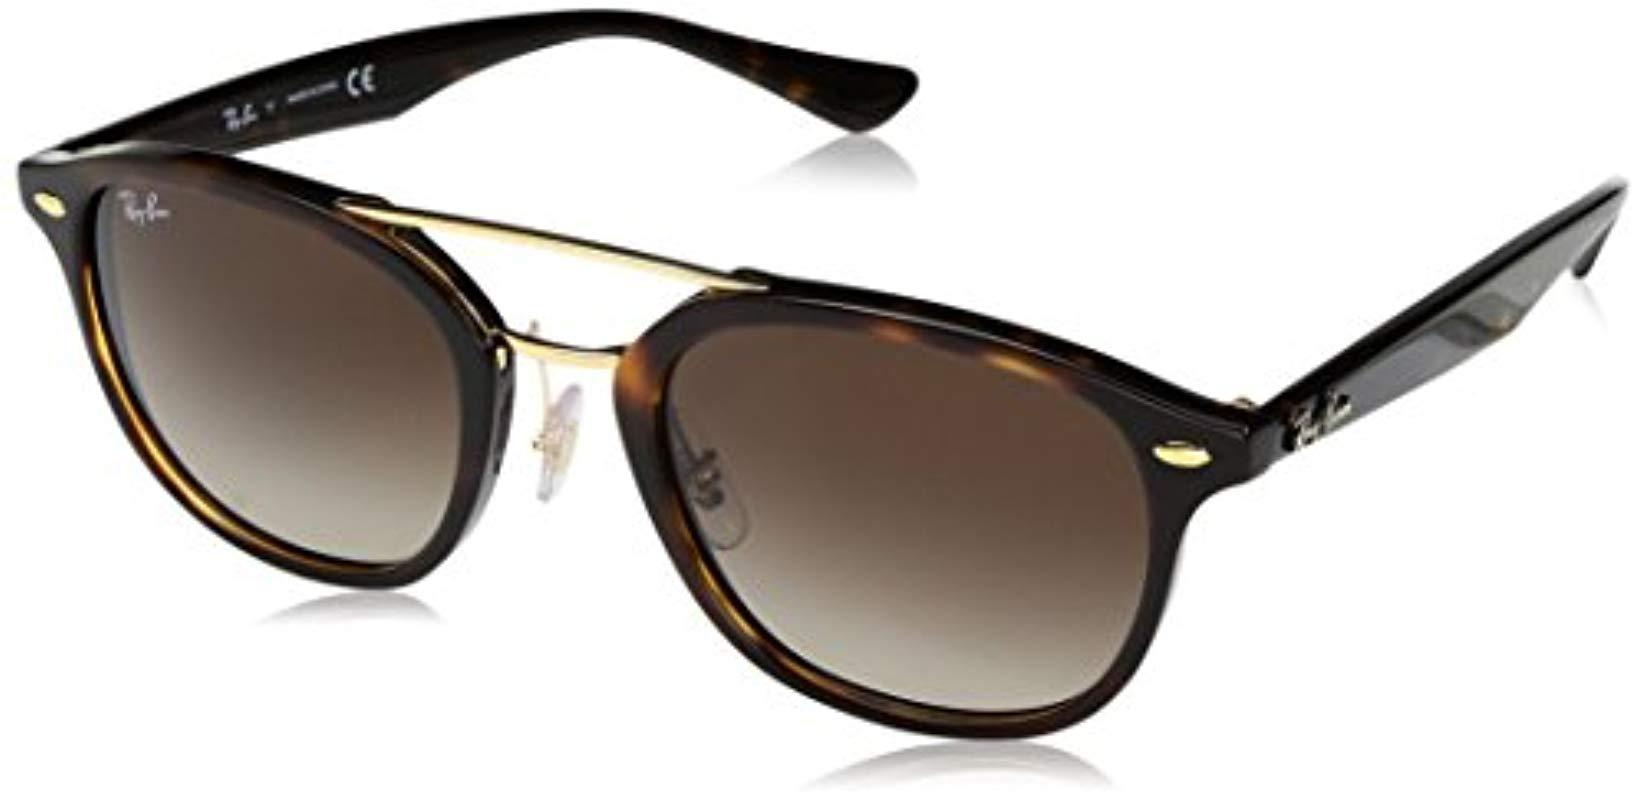 c16da69ae31c Ray-Ban Classic Double Bridge Sunglasses In Havana Brown Rb2183 ...